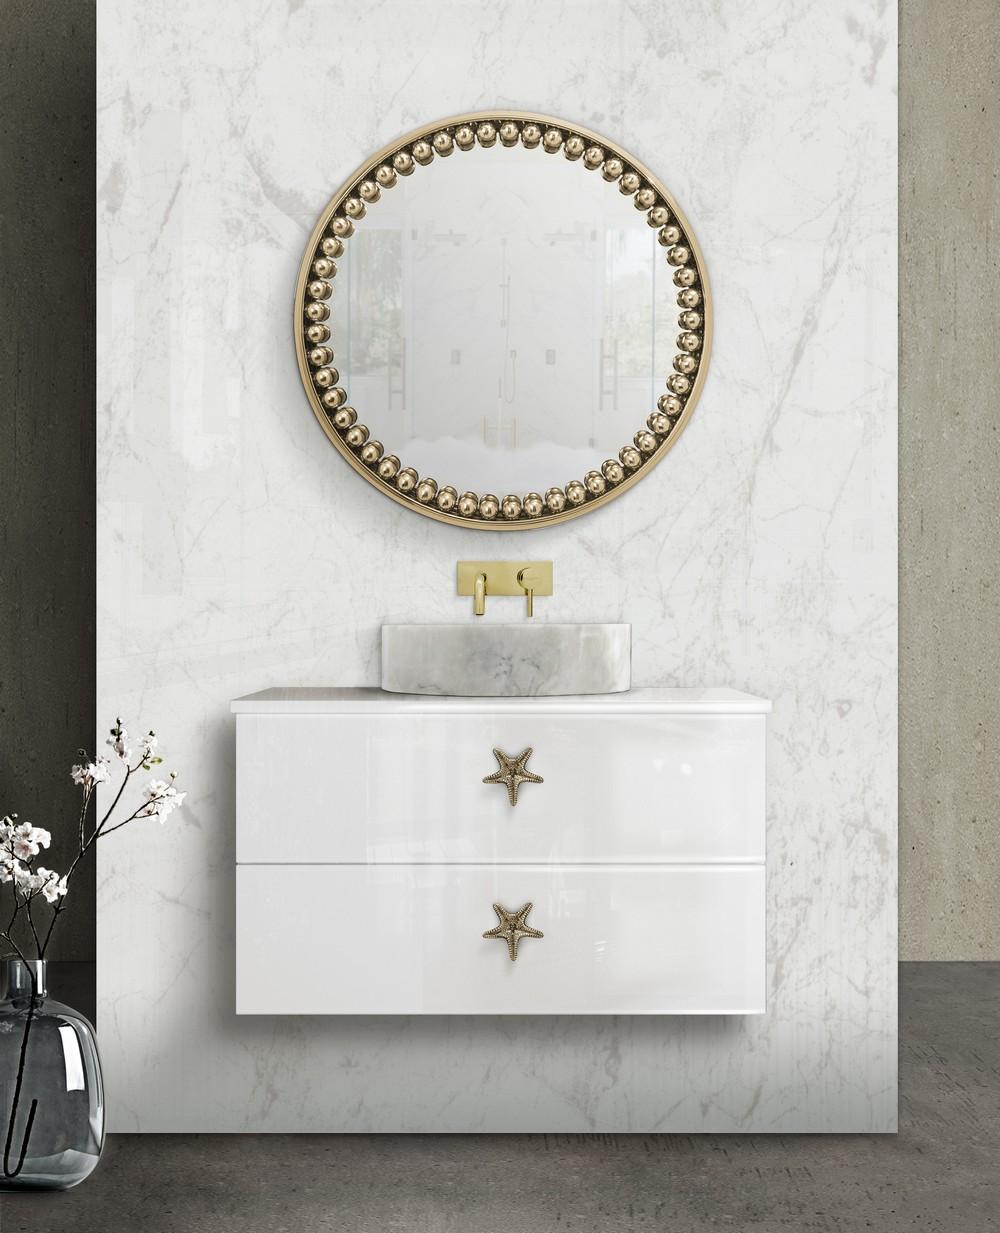 Bathroom Design Come Upon the Best Luxury Showrooms in Melbourne (4)